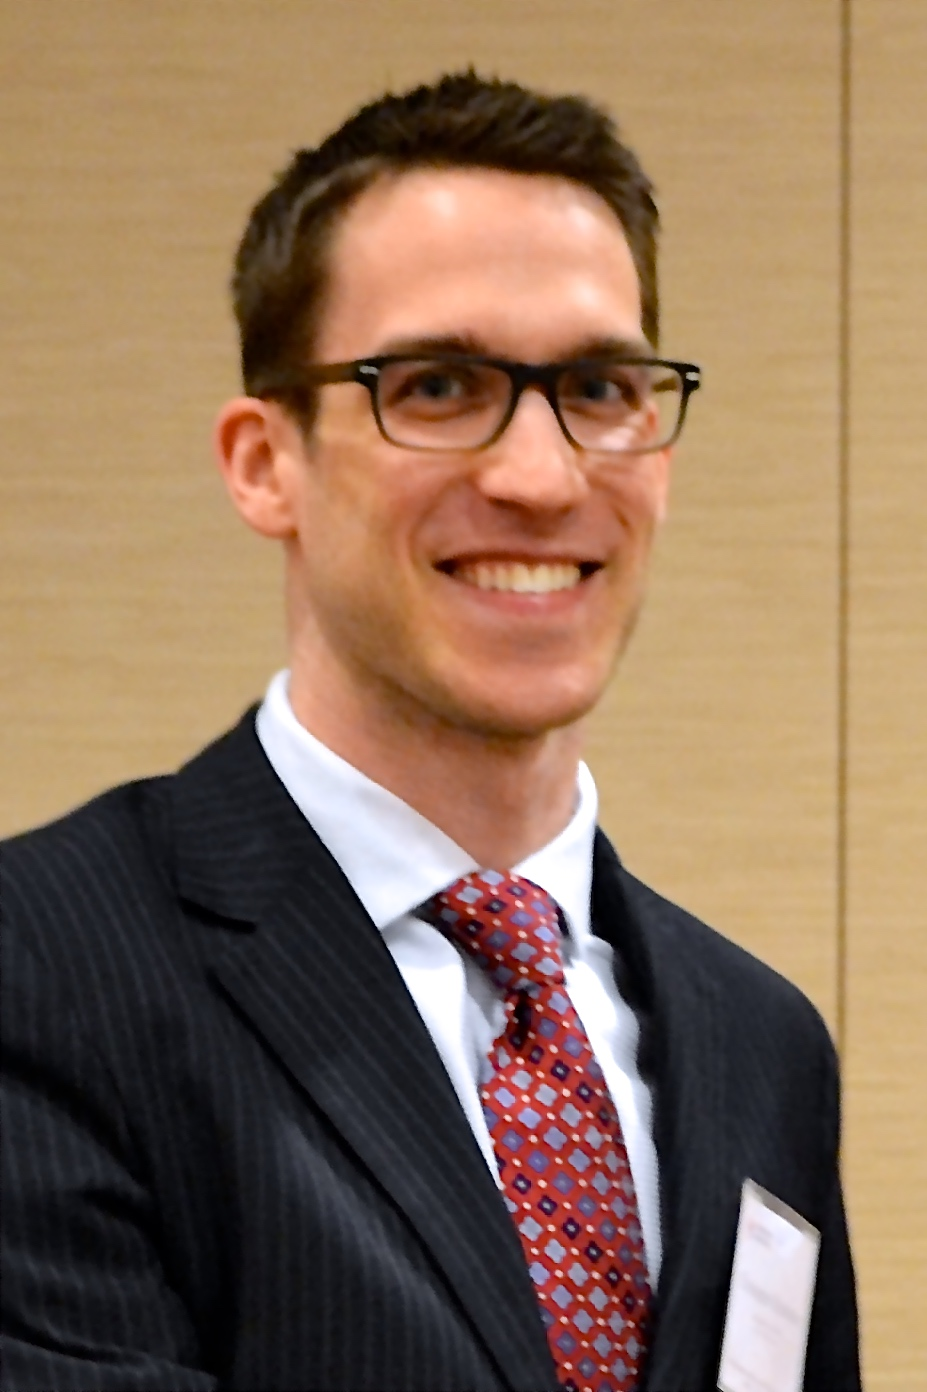 Christopher Kreutzne